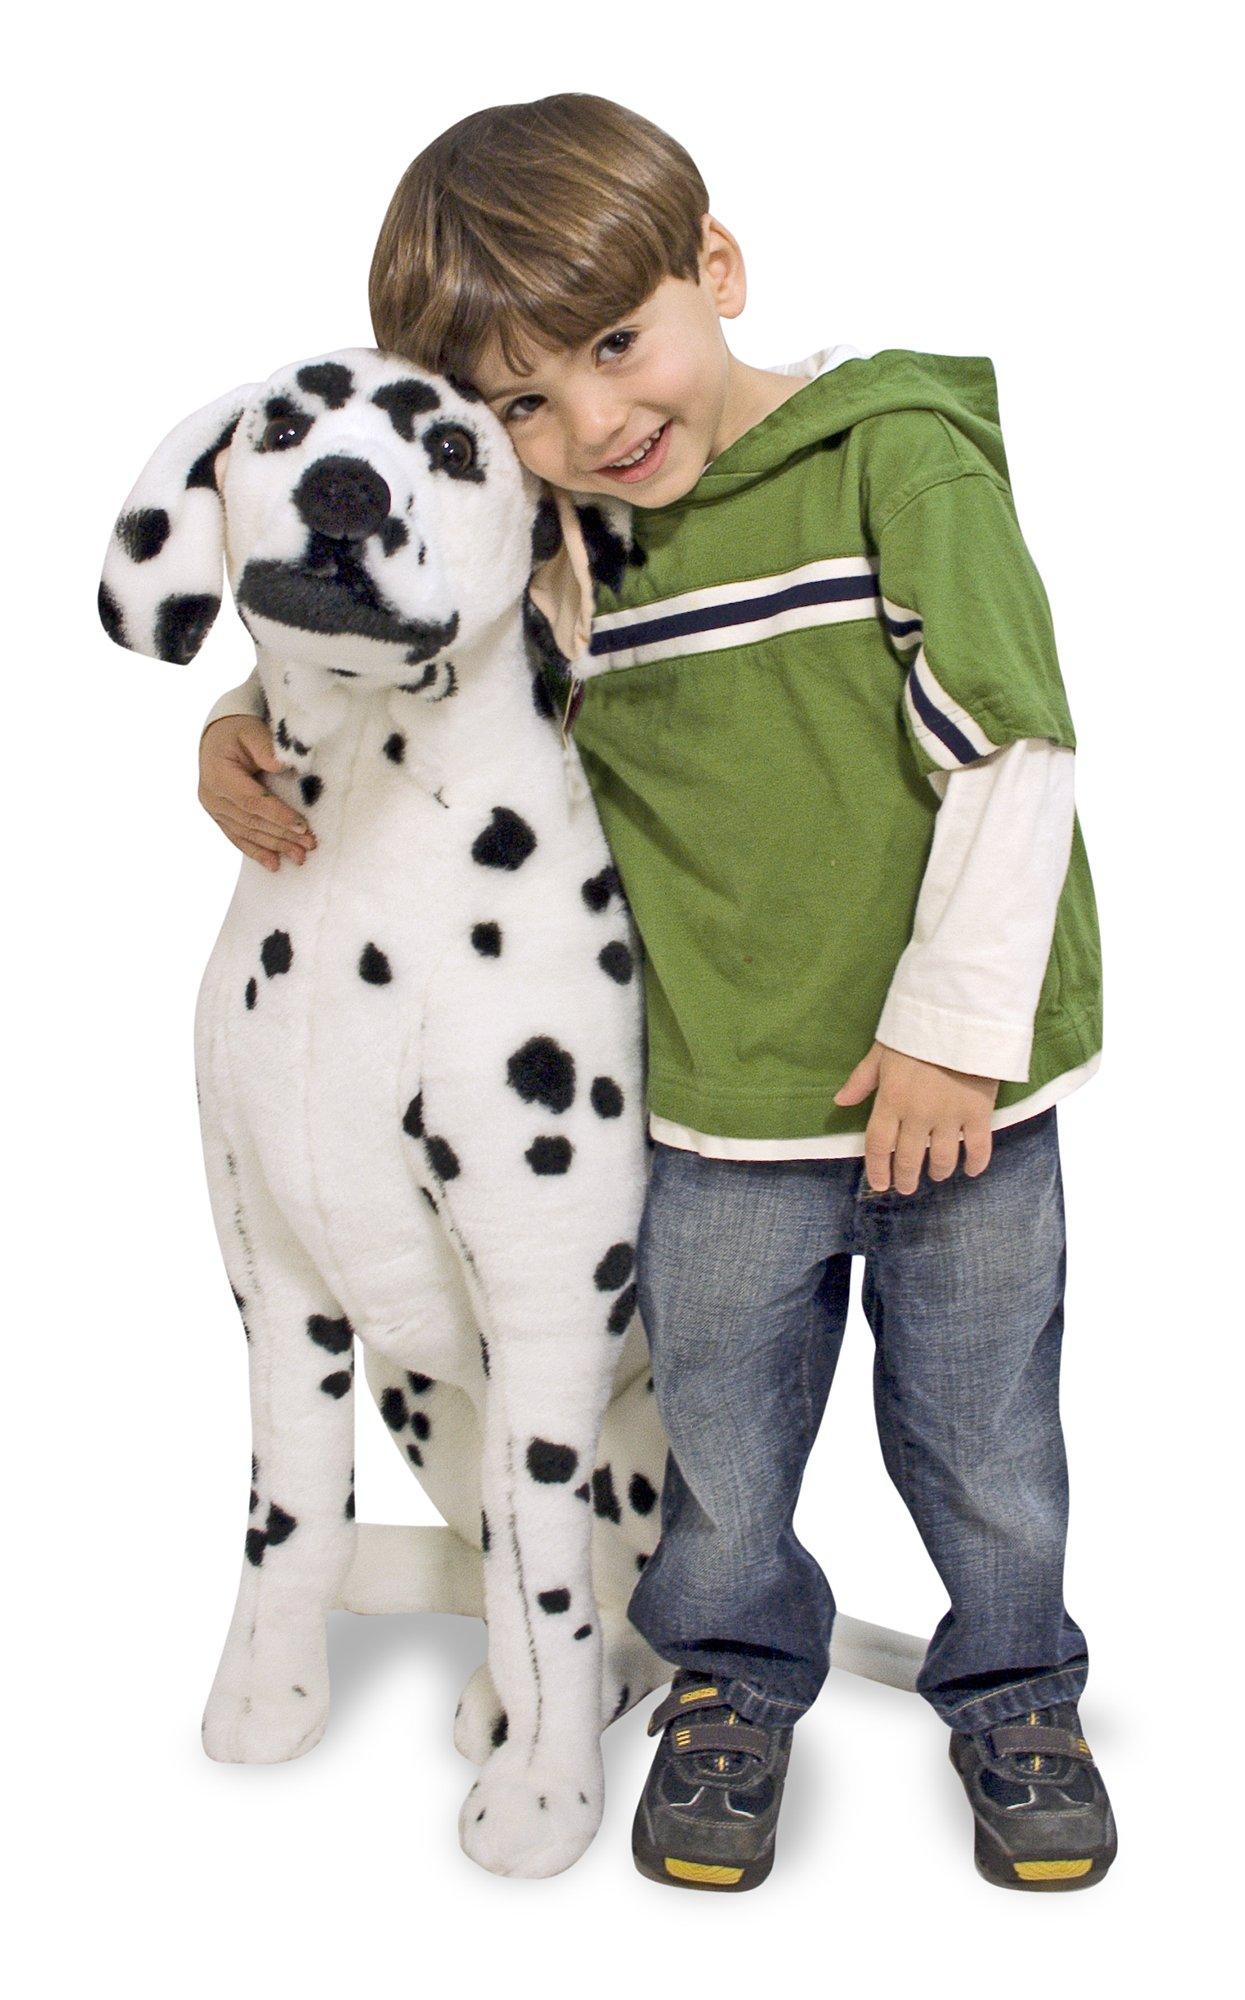 Melissa & Doug Giant Dalmatian - Lifelike Stuffed Animal Dog (over 2 feet tall) by Melissa & Doug